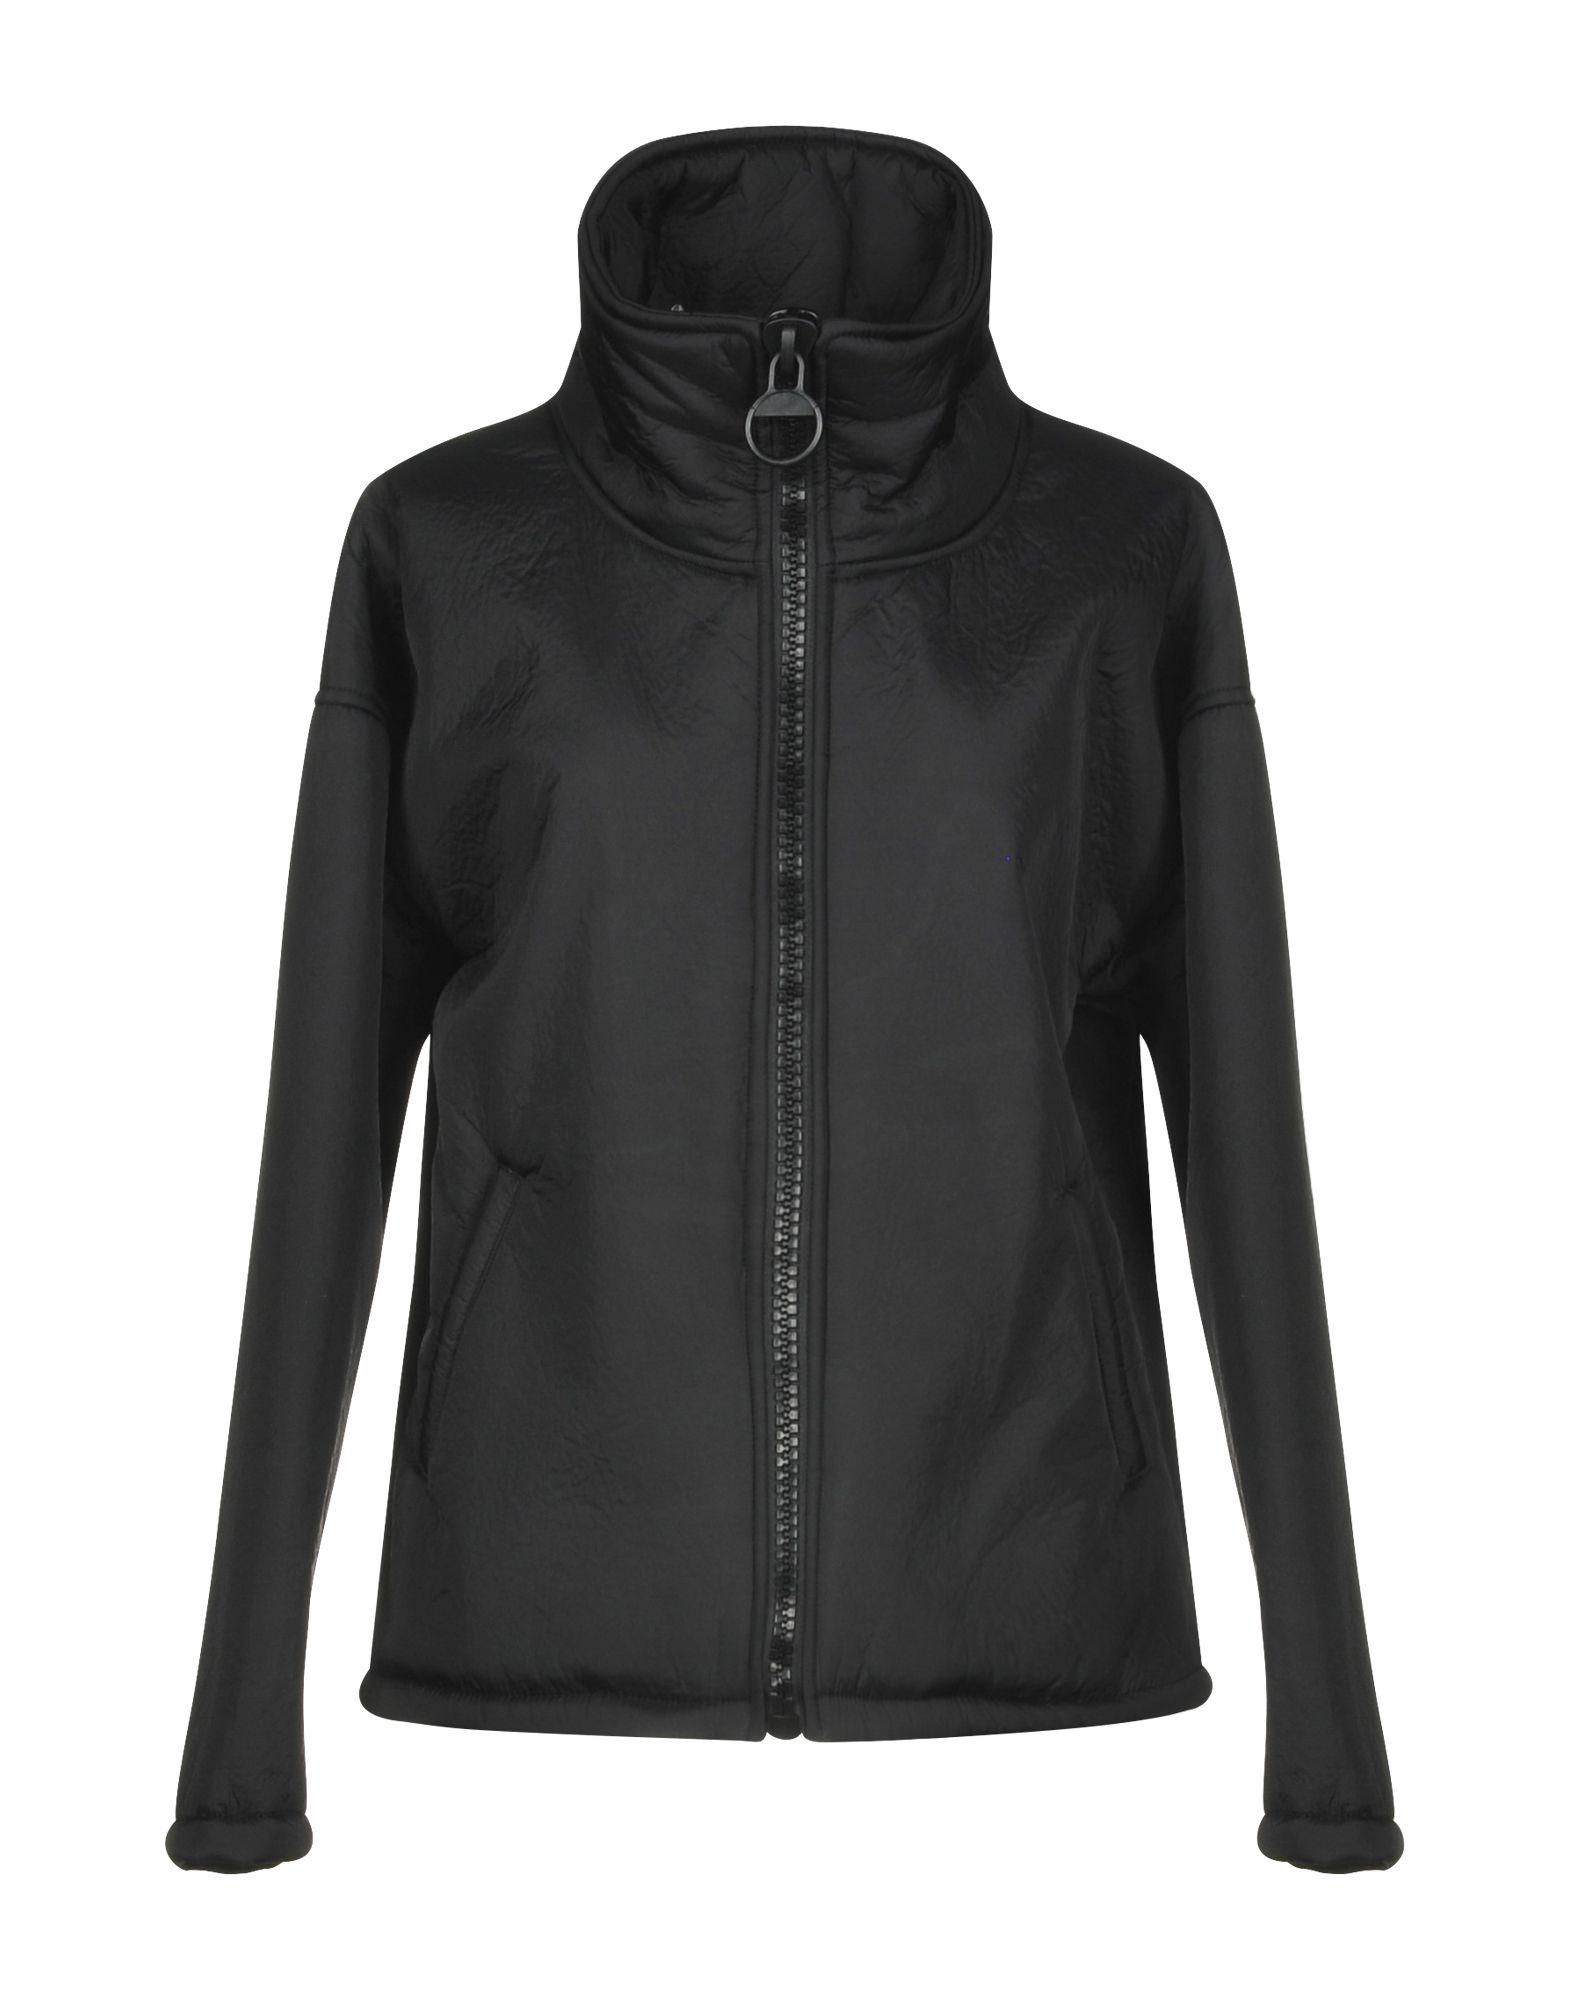 NUMERO 00 Jacket in Black